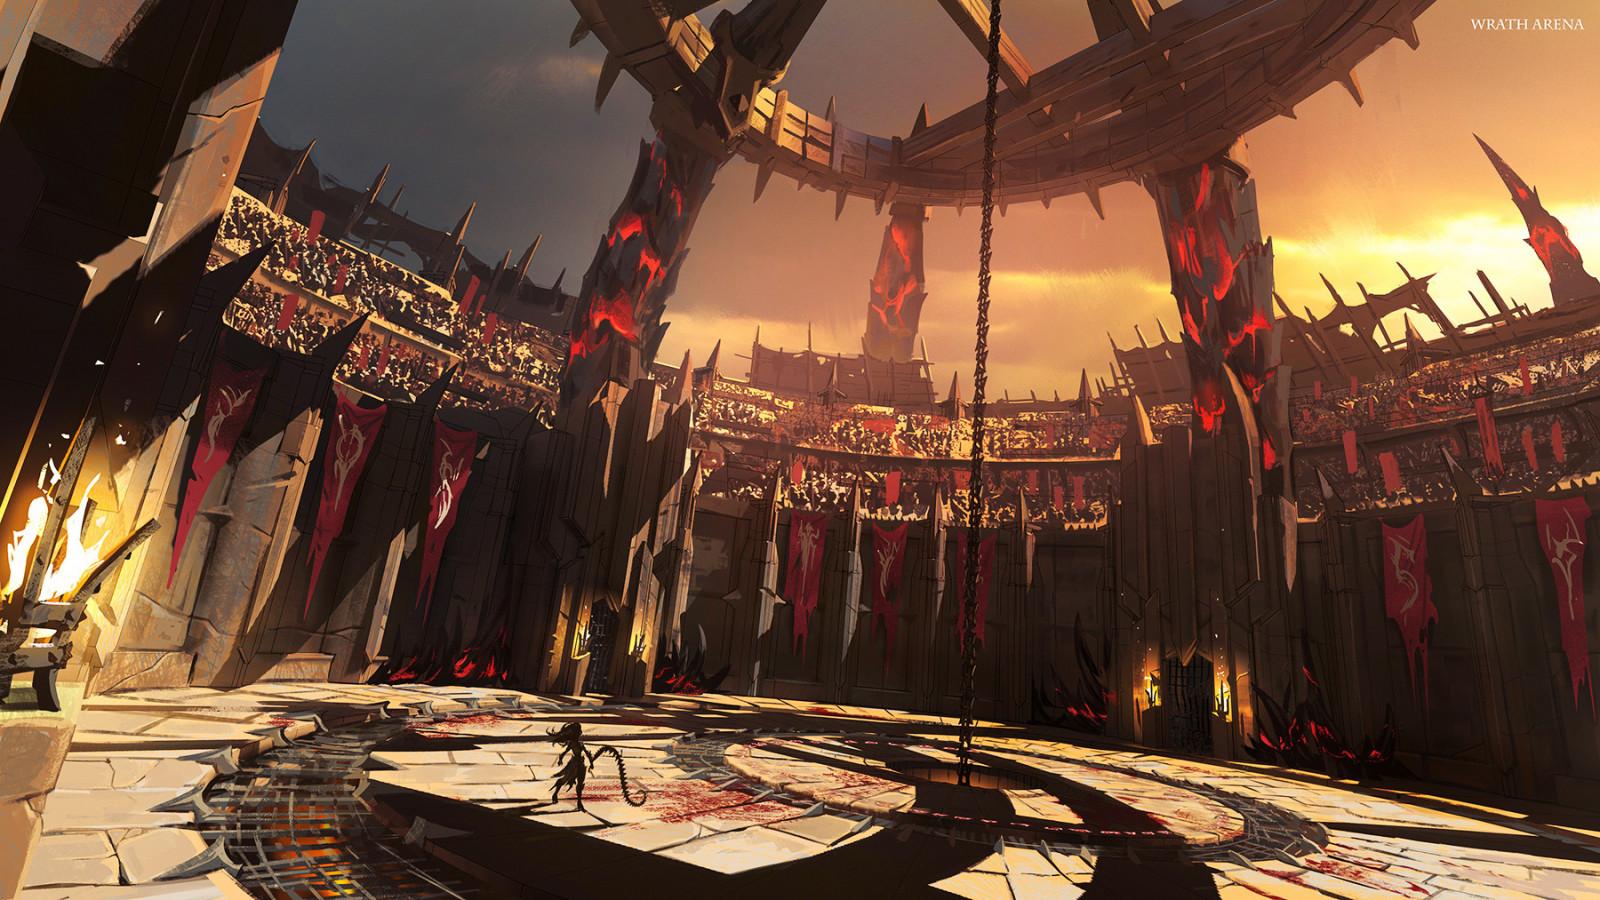 https://c.wallhere.com/photos/8a/58/digital_art_artwork_fantasy_art_video_games_Darksiders_3_arena-1610427.jpg!d